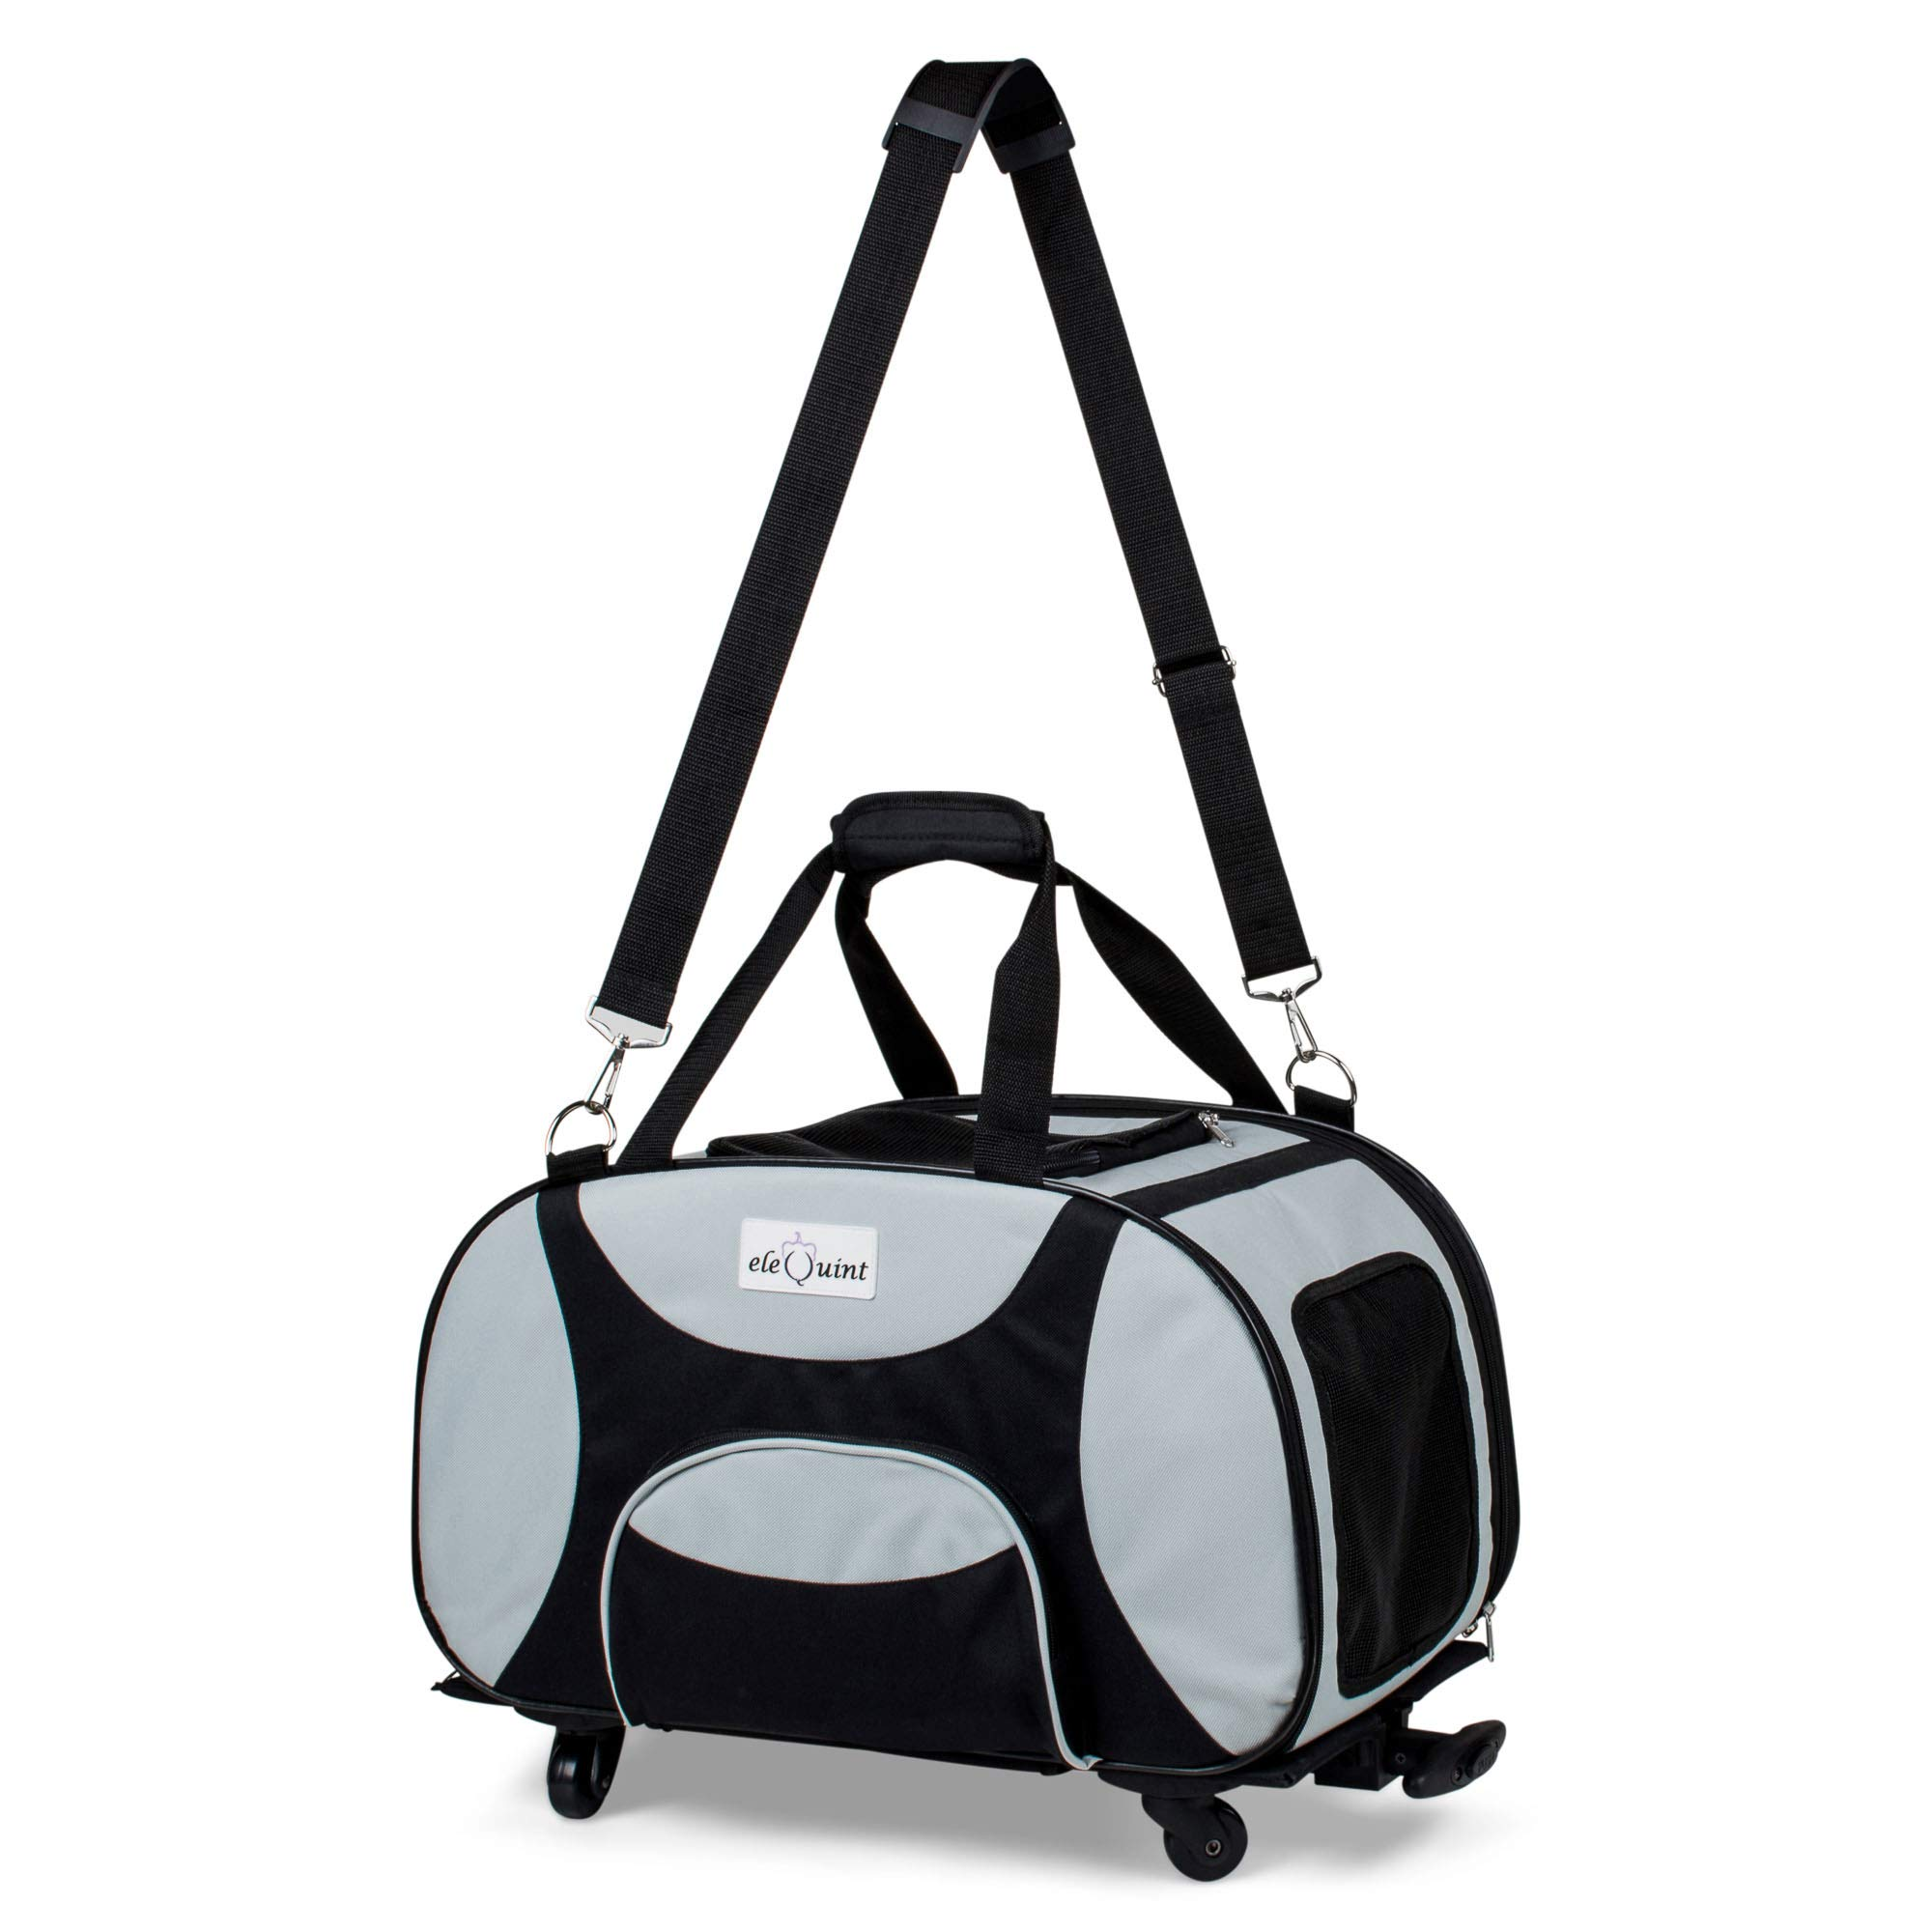 eleQuint Soft Sided Travel Pet Carrier with Detachable Wheel Platform and Fleece Pet Mat